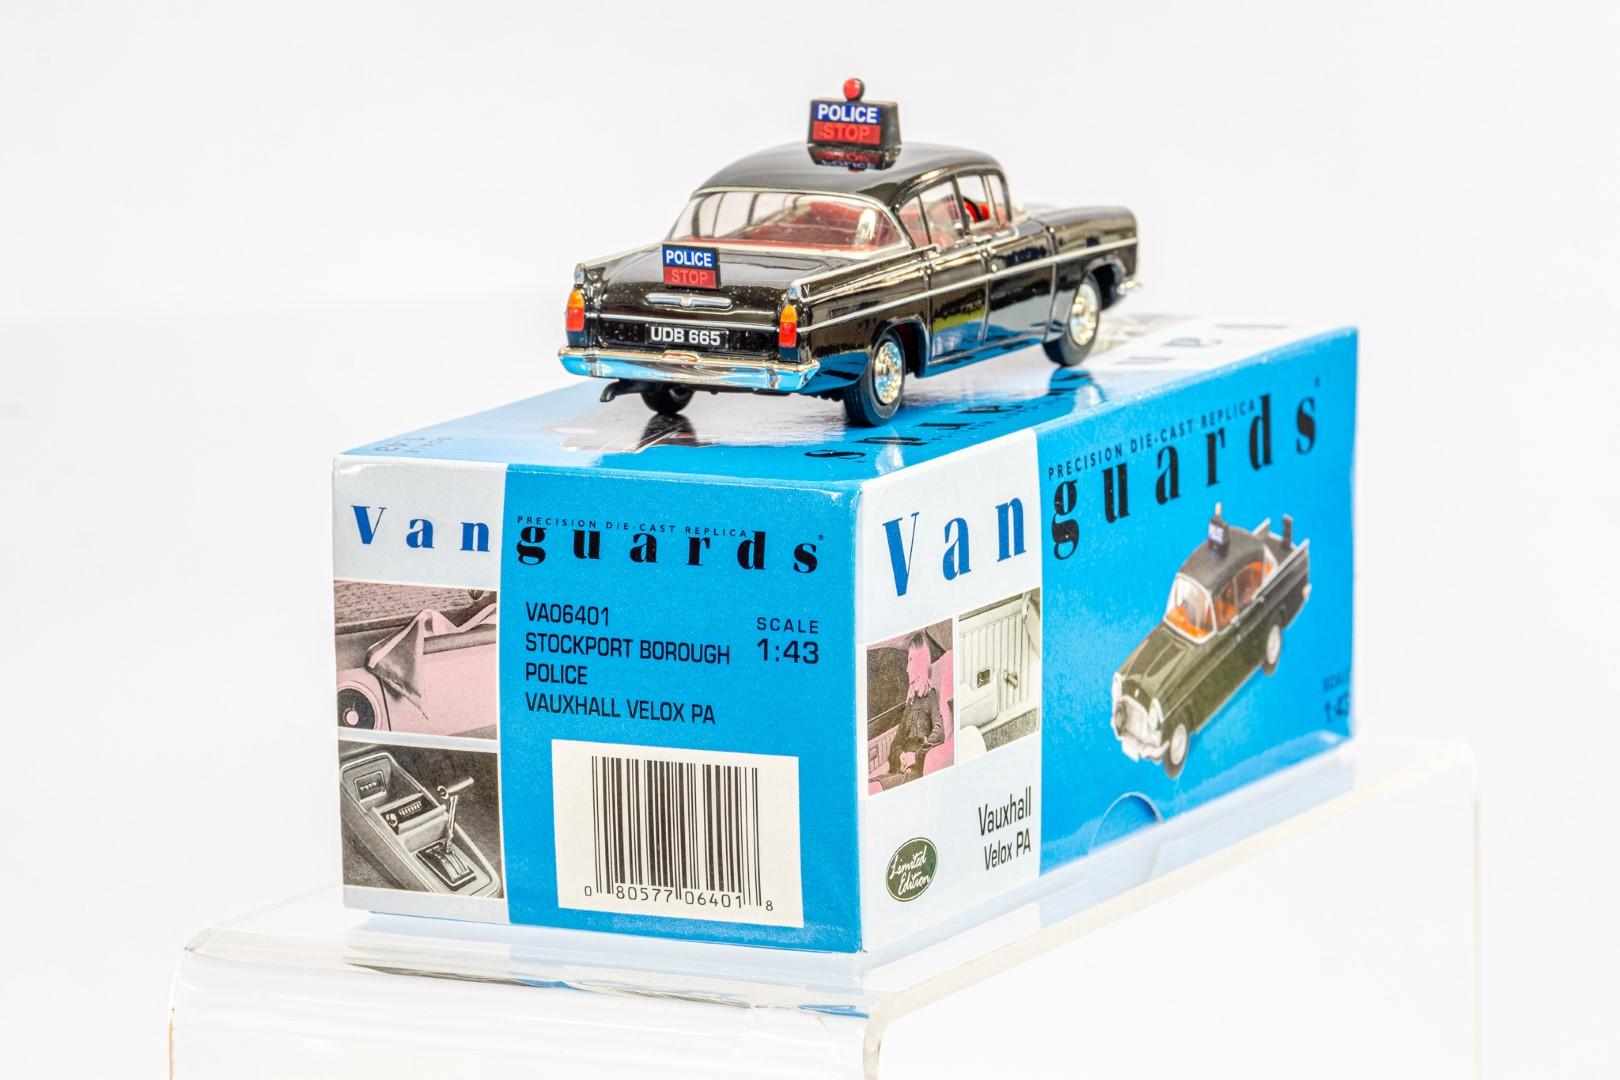 Vanguards Vauxhall Velox PA - Stockport Borough Police - Image 4 of 8